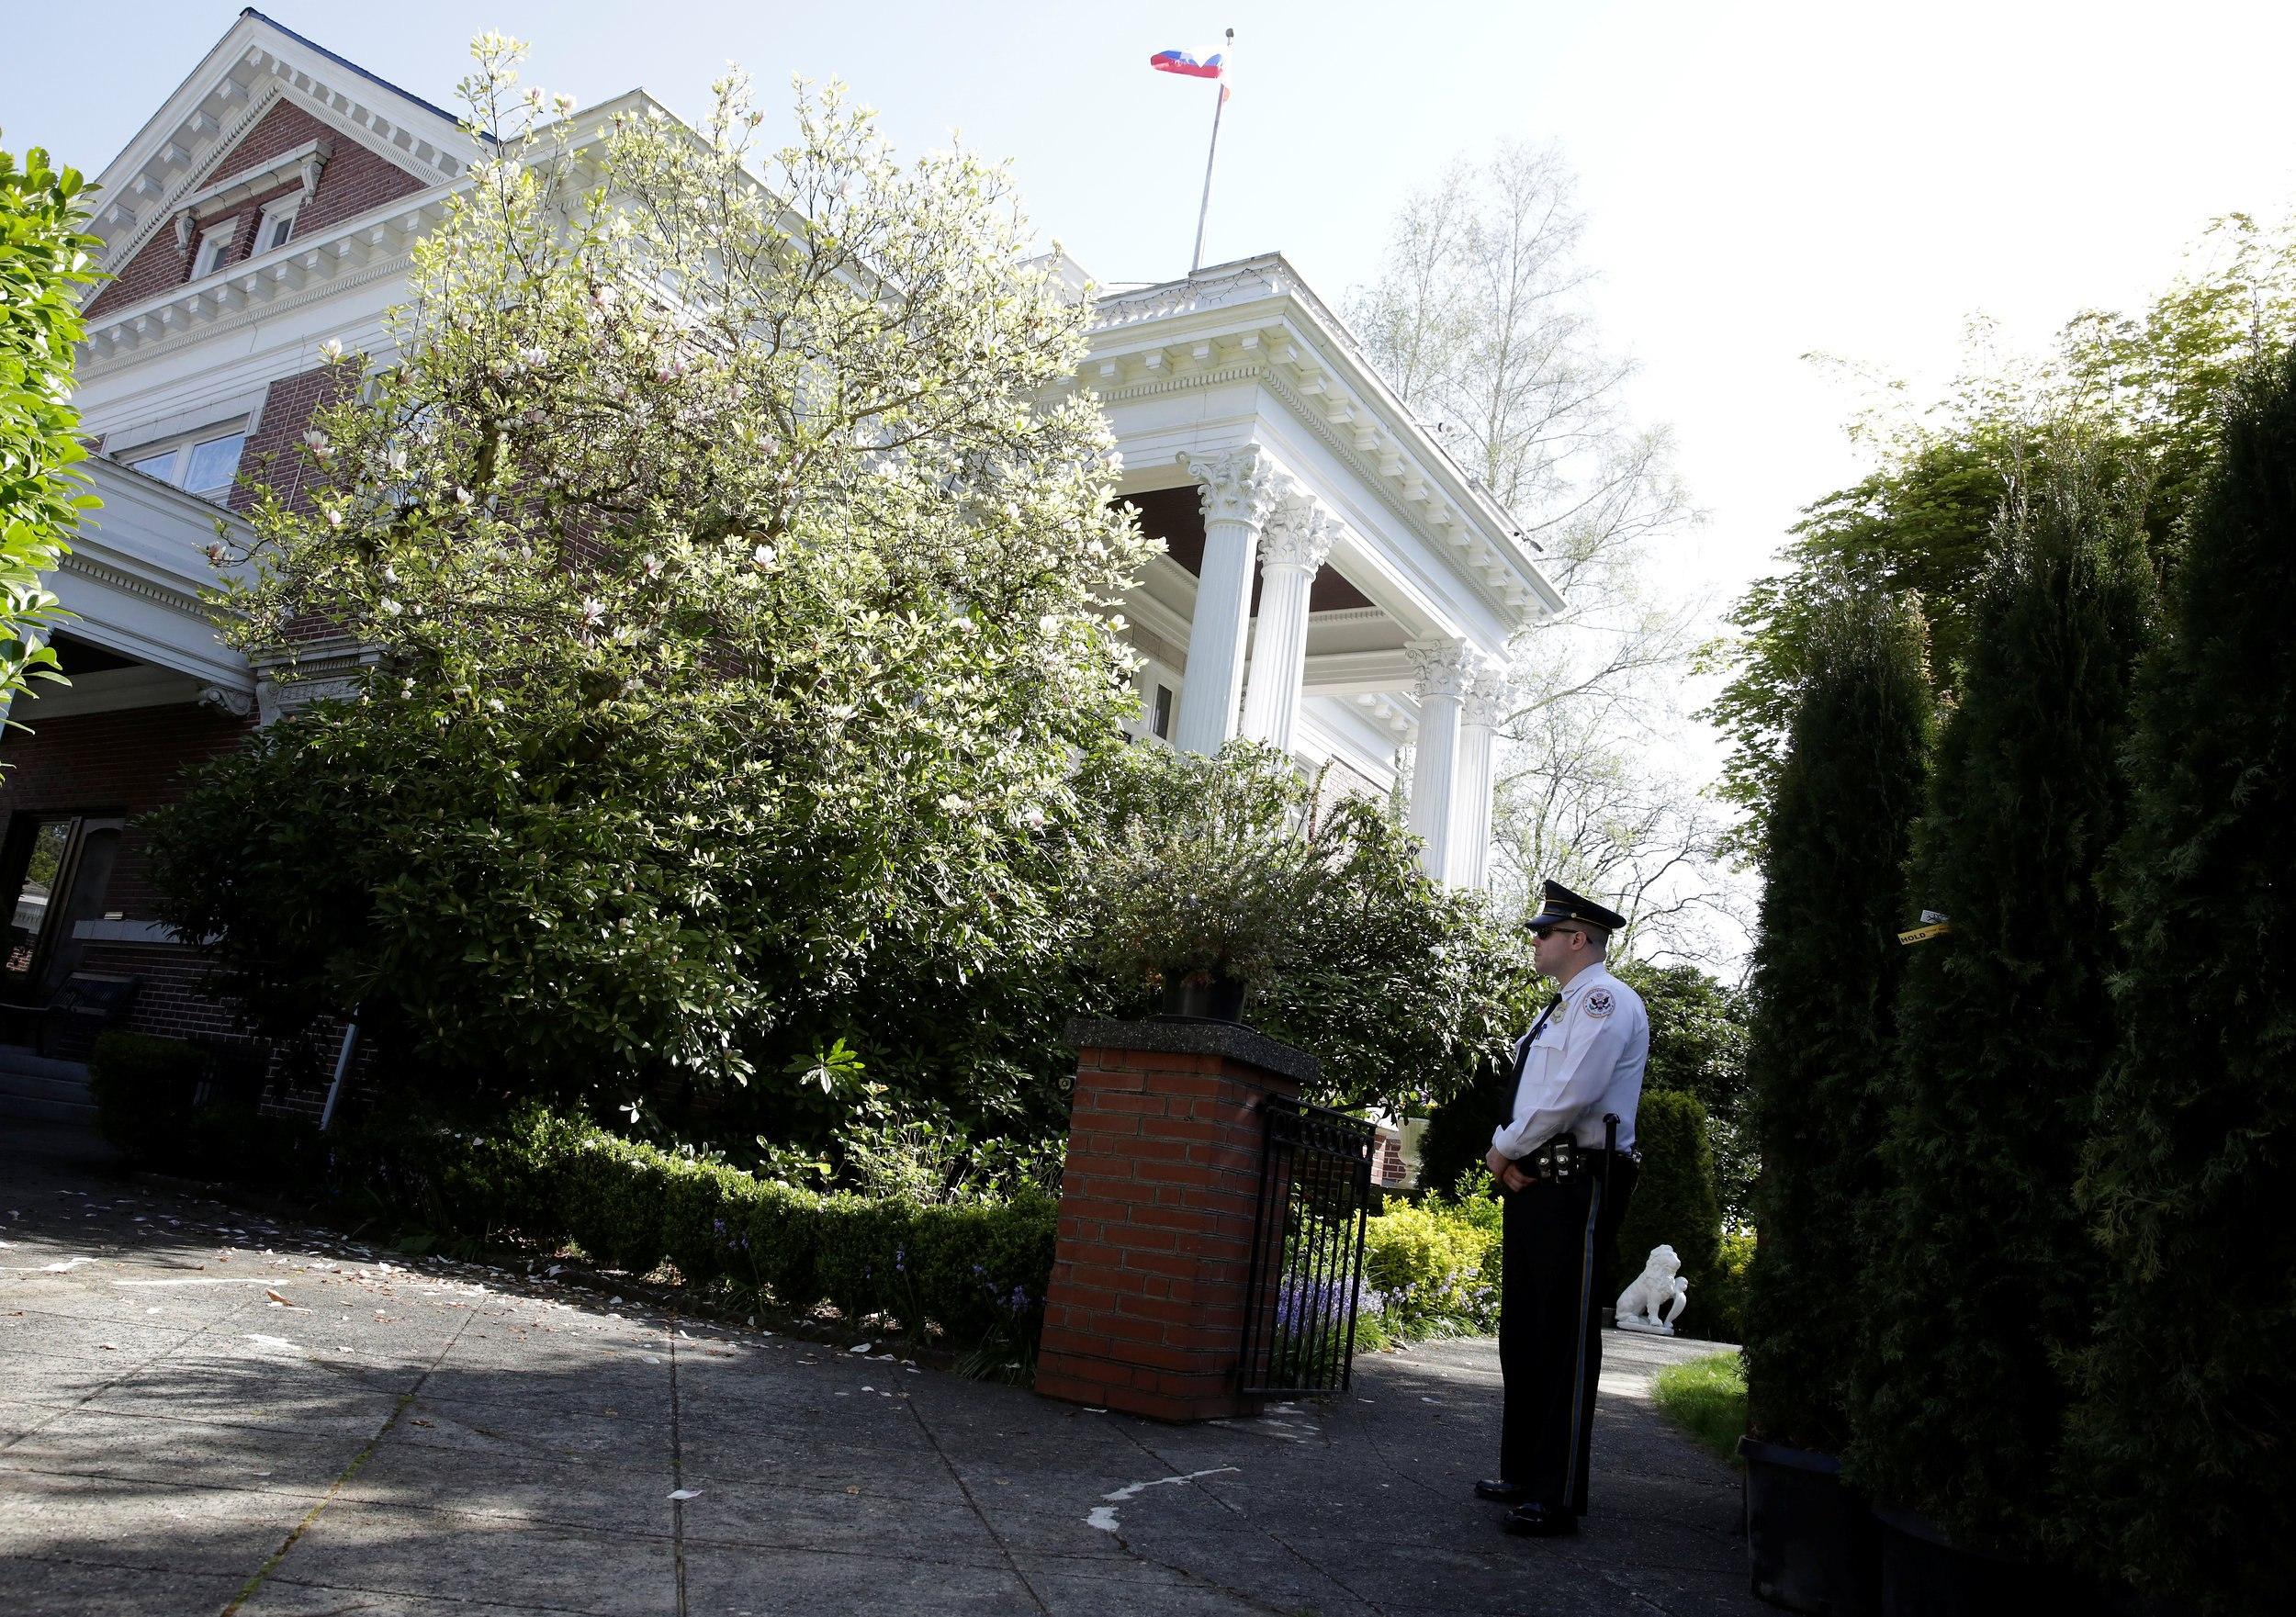 В Госдепе объяснили проникновение на территорию резиденции российского консула в Сиэтле